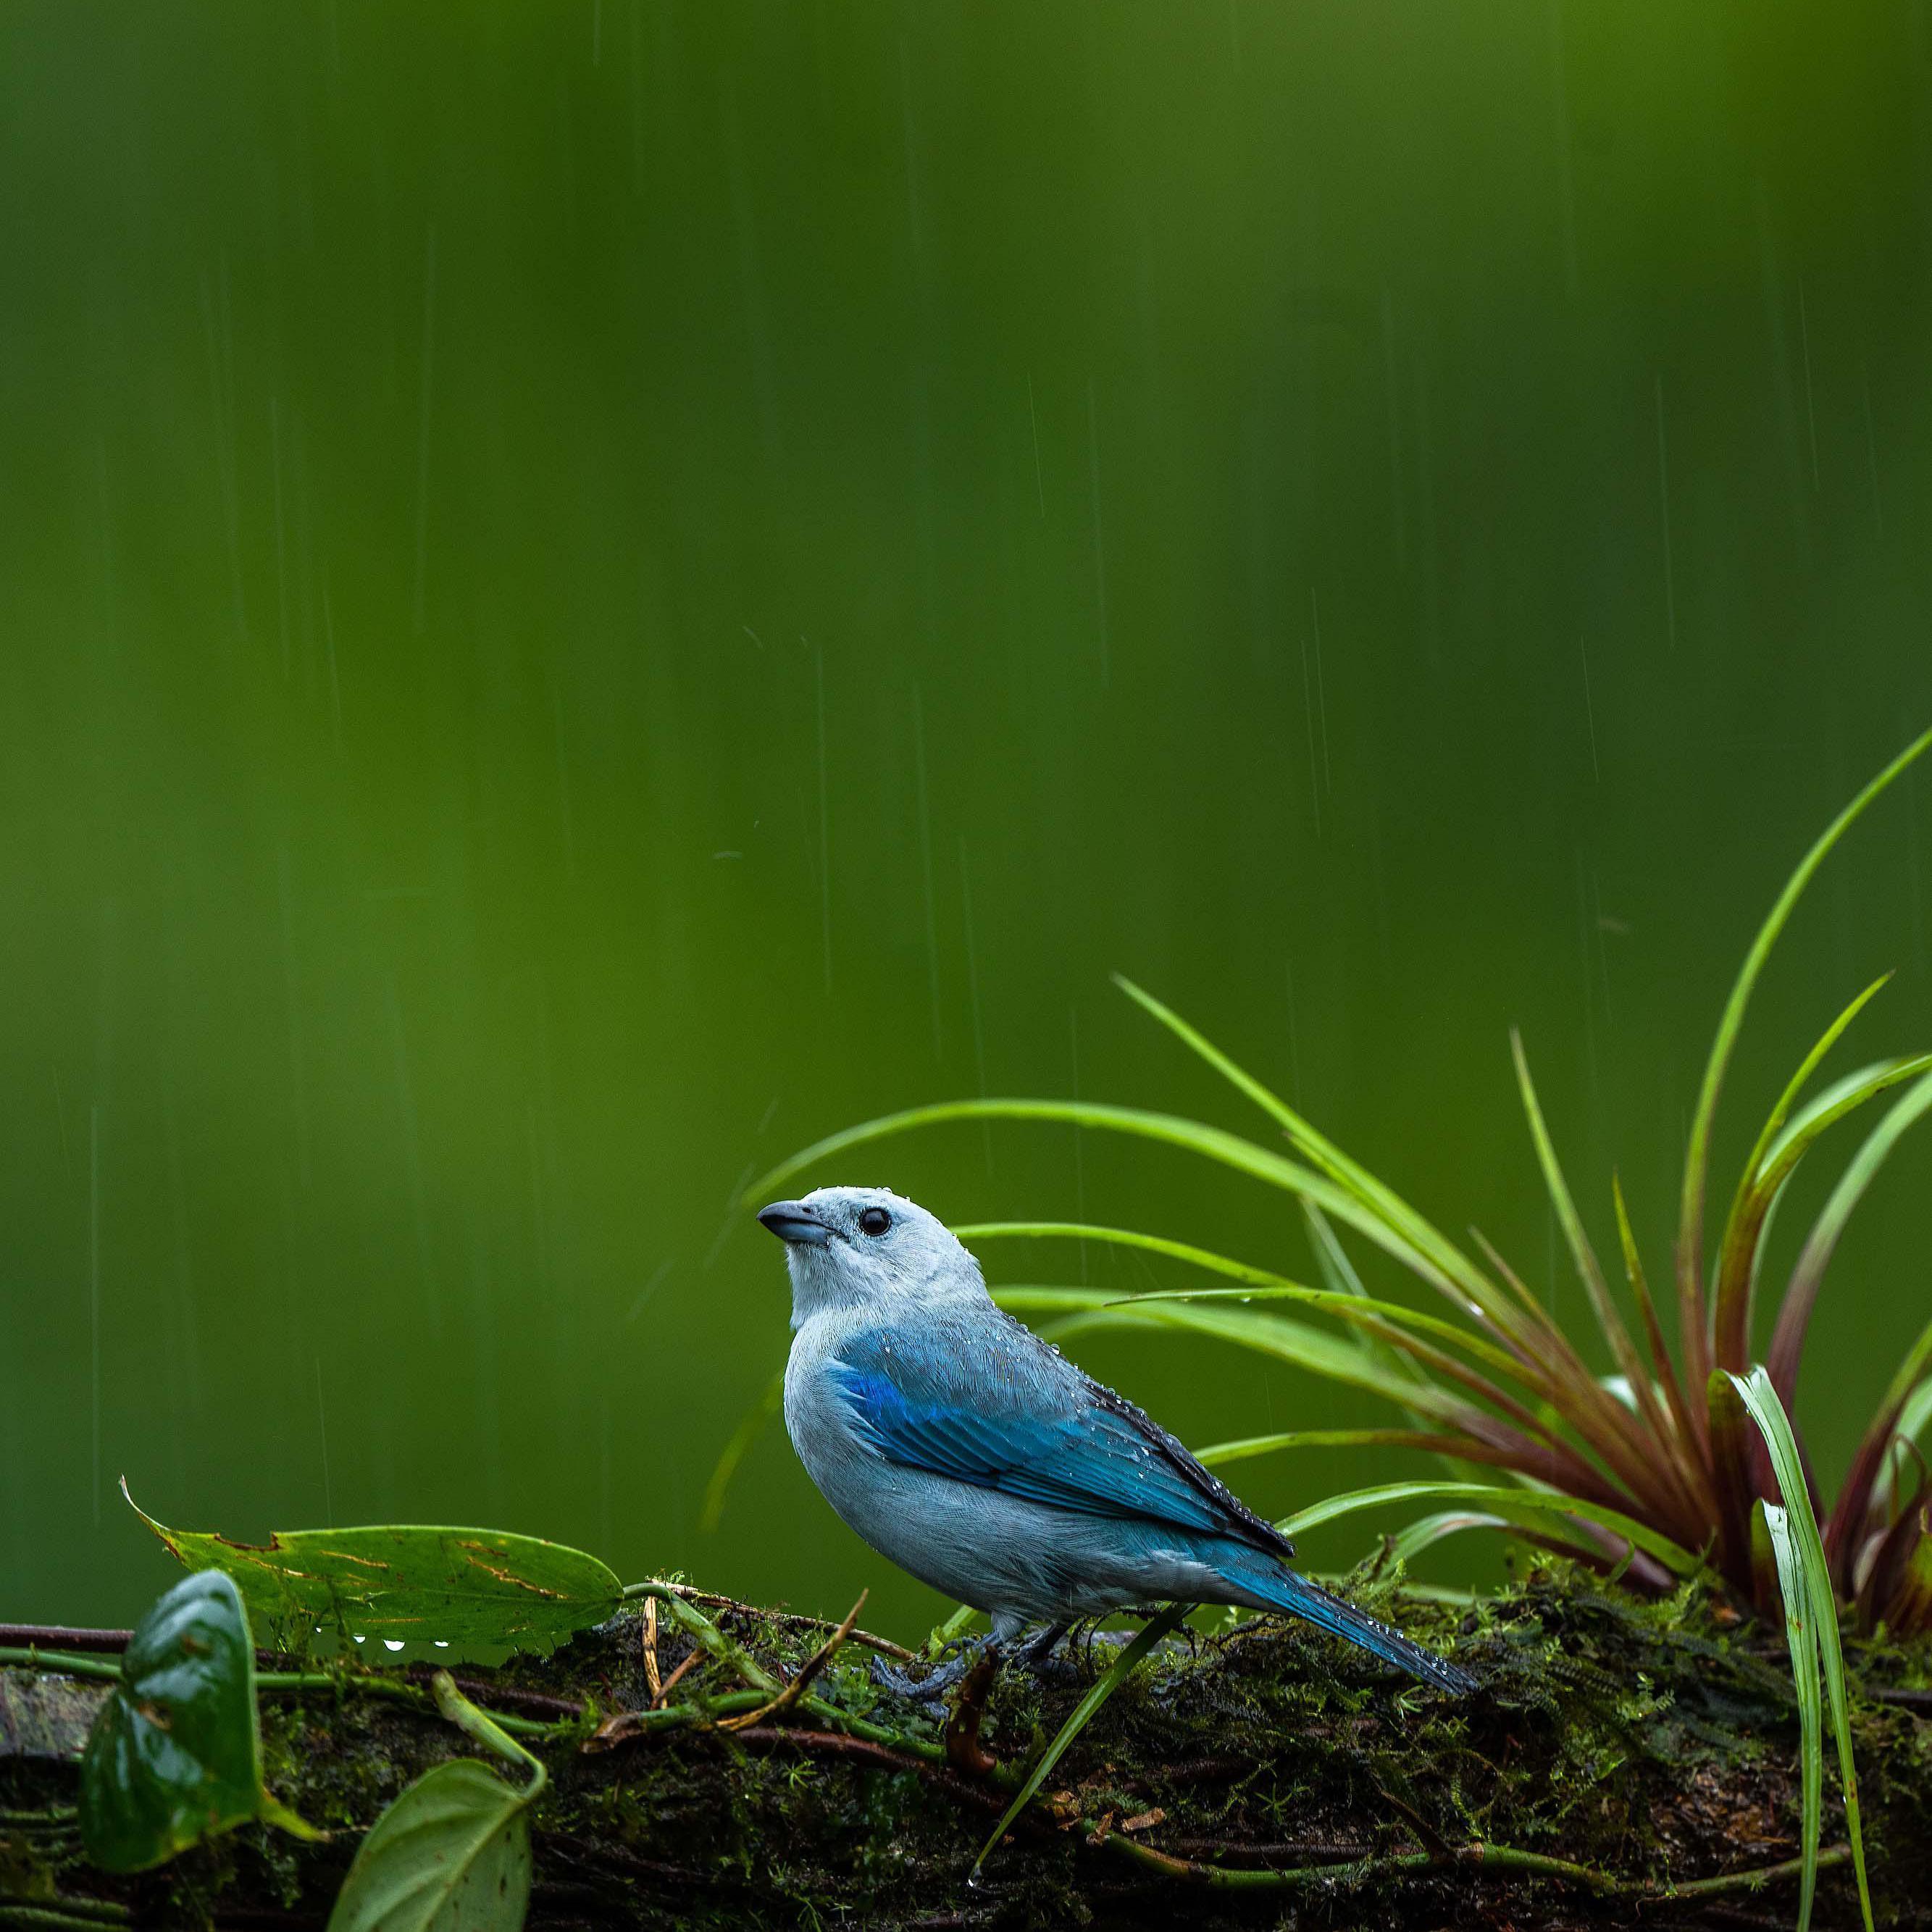 Image of Bluebird, Wildlife, Green, Blue, Beak, Nature etc.